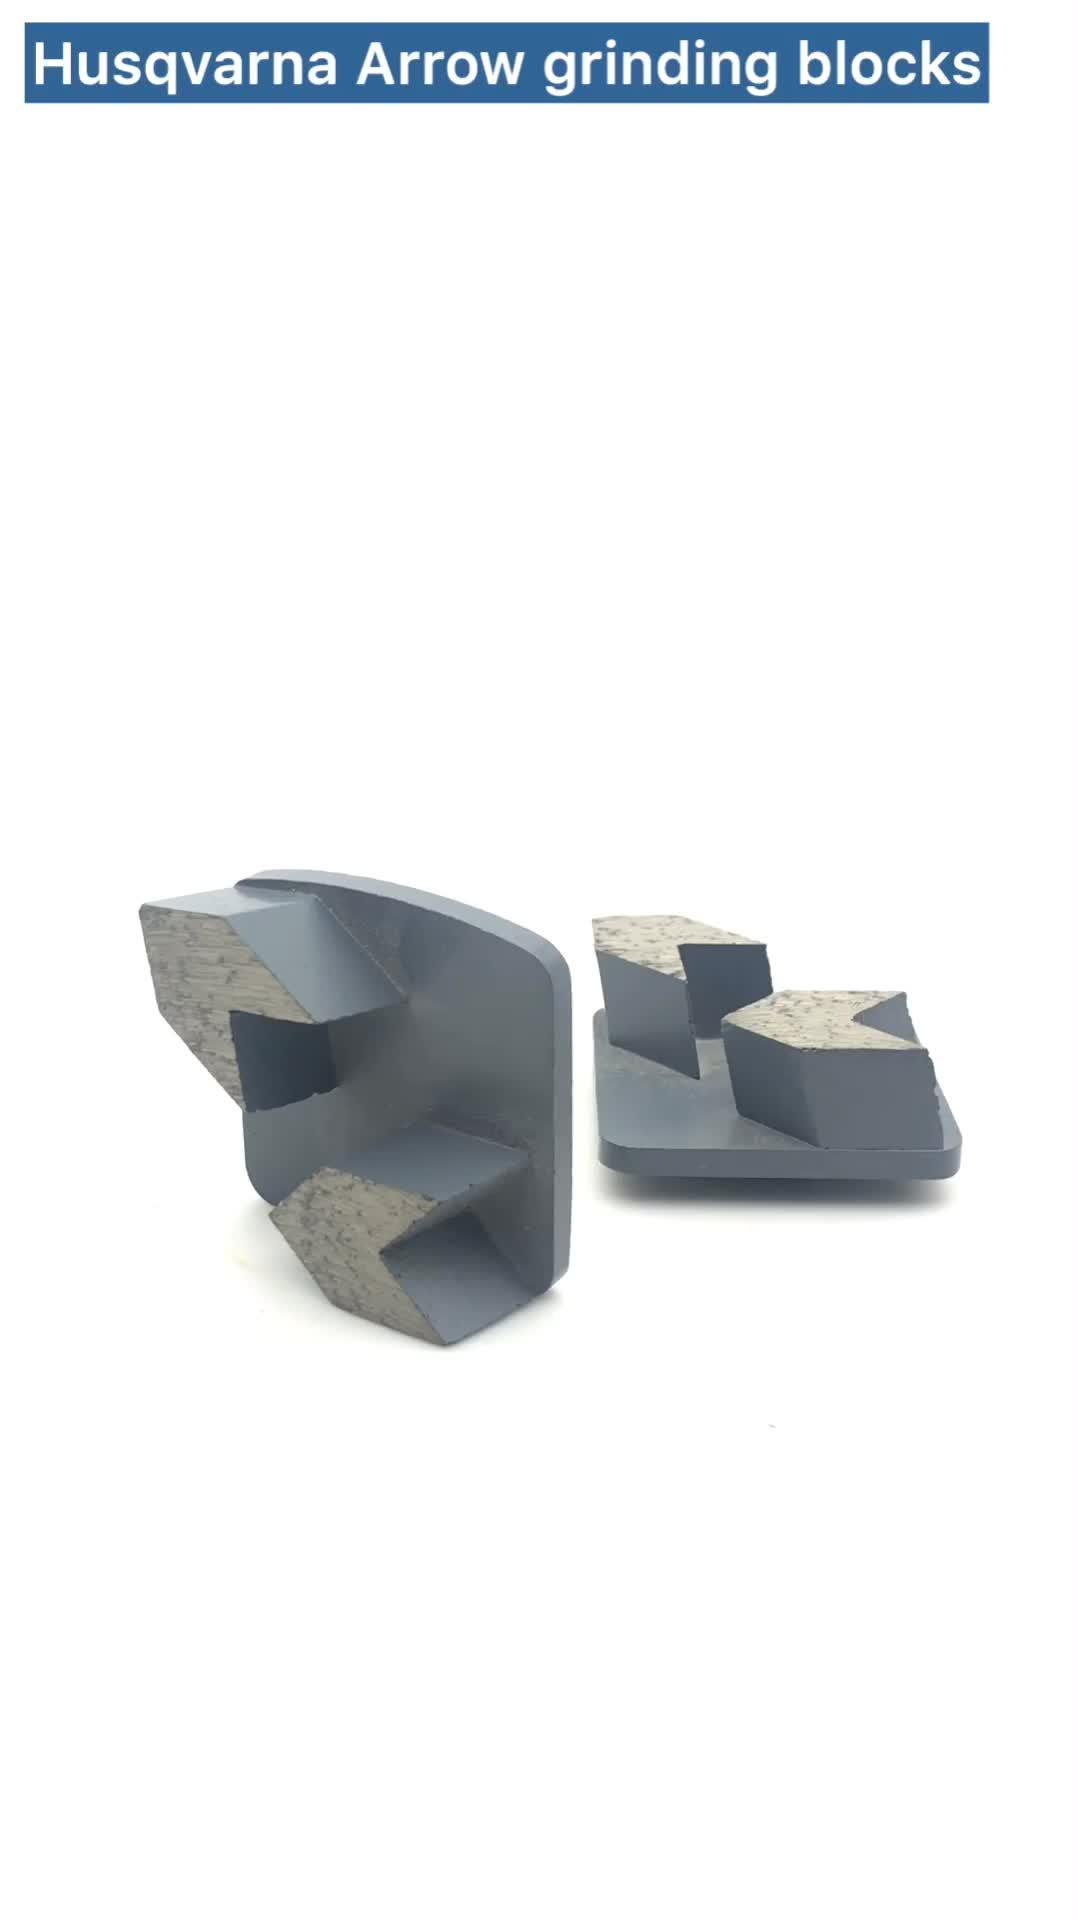 Diamond Concrete Floor Grinding Pads for Husqvarna Redi Lock System HUSQVARNA G1100S Quality